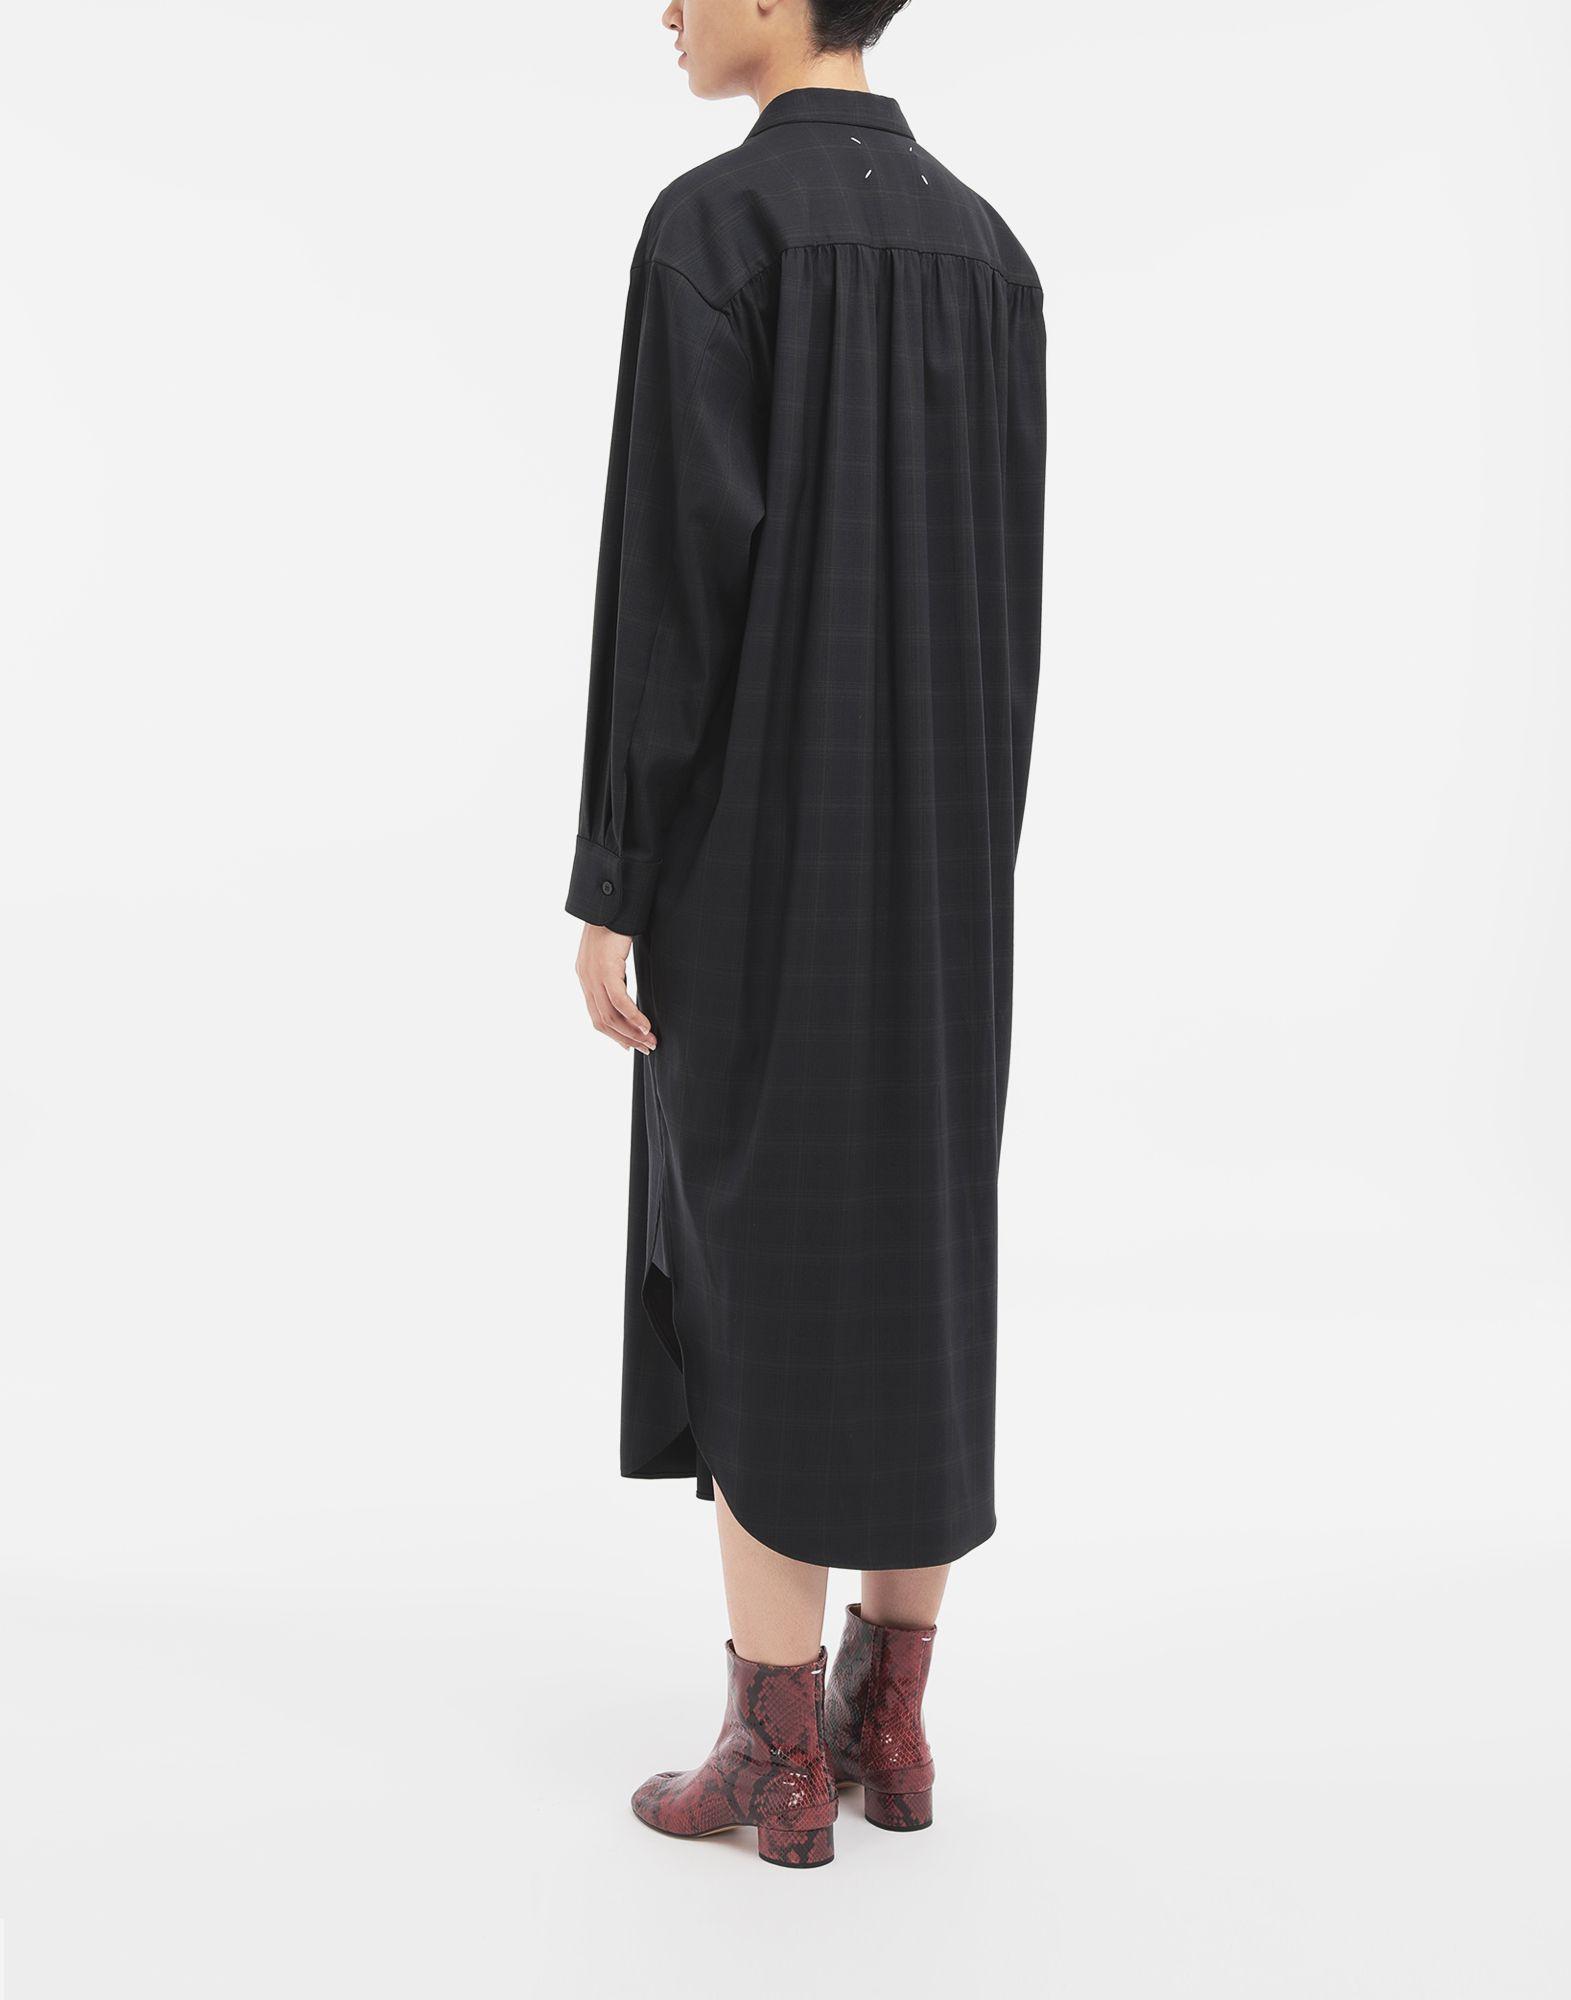 MAISON MARGIELA Kariertes Hemdkleid aus Wolle Kleid Dame e